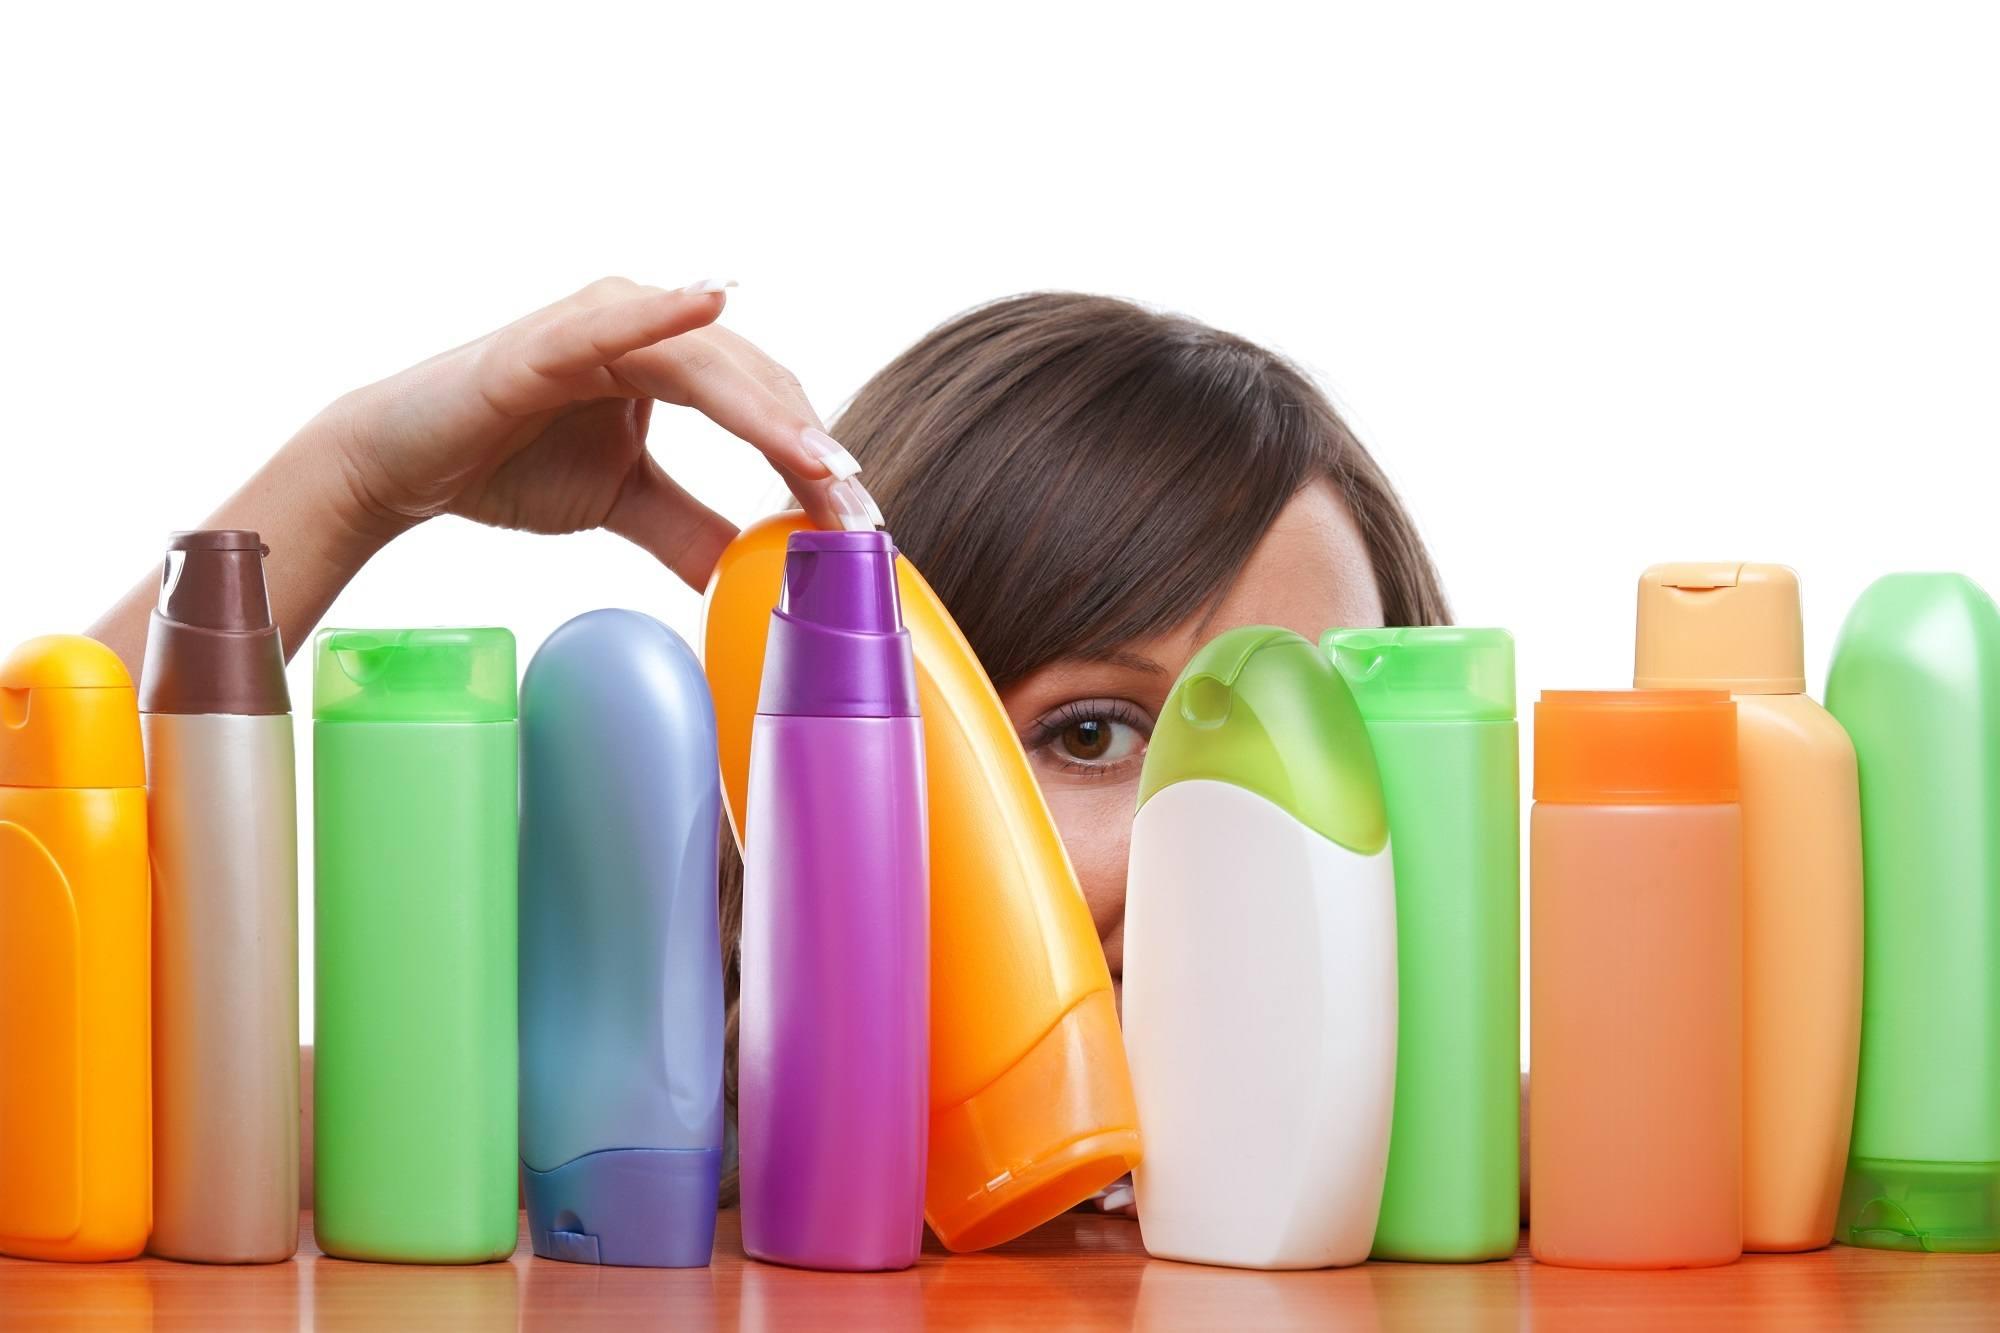 Вся правда о шампунях: шокирующие факты   Beauty Hair Expert